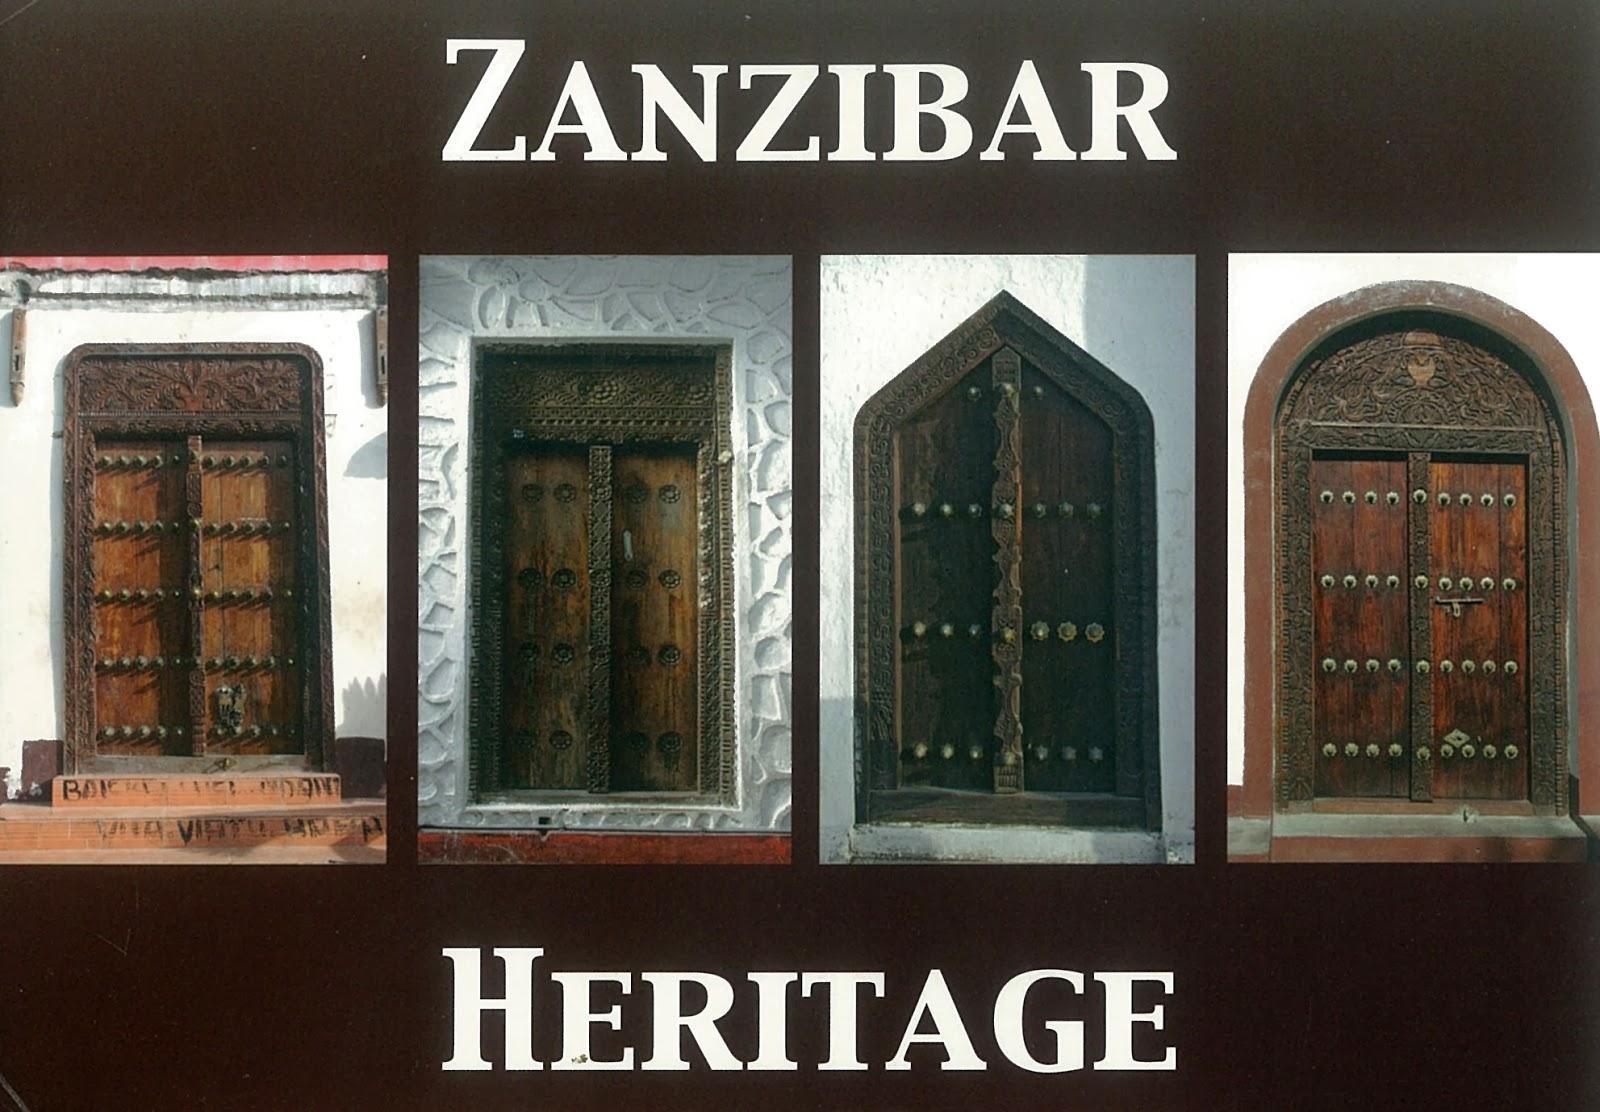 Dating Sites i Zanzibar Speed dating Canterbury den cubanske